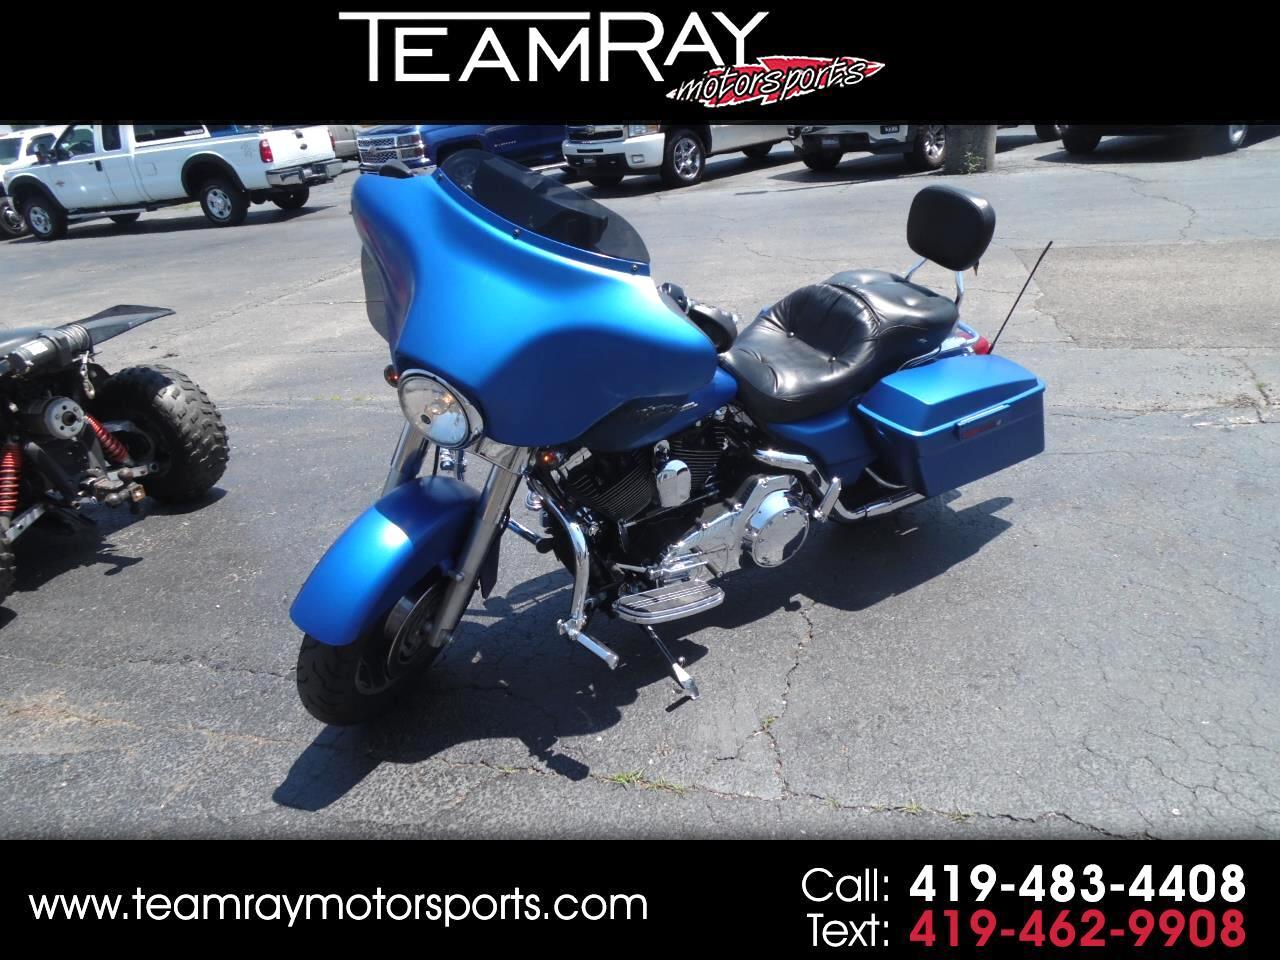 2007 Harley-Davidson FLHX